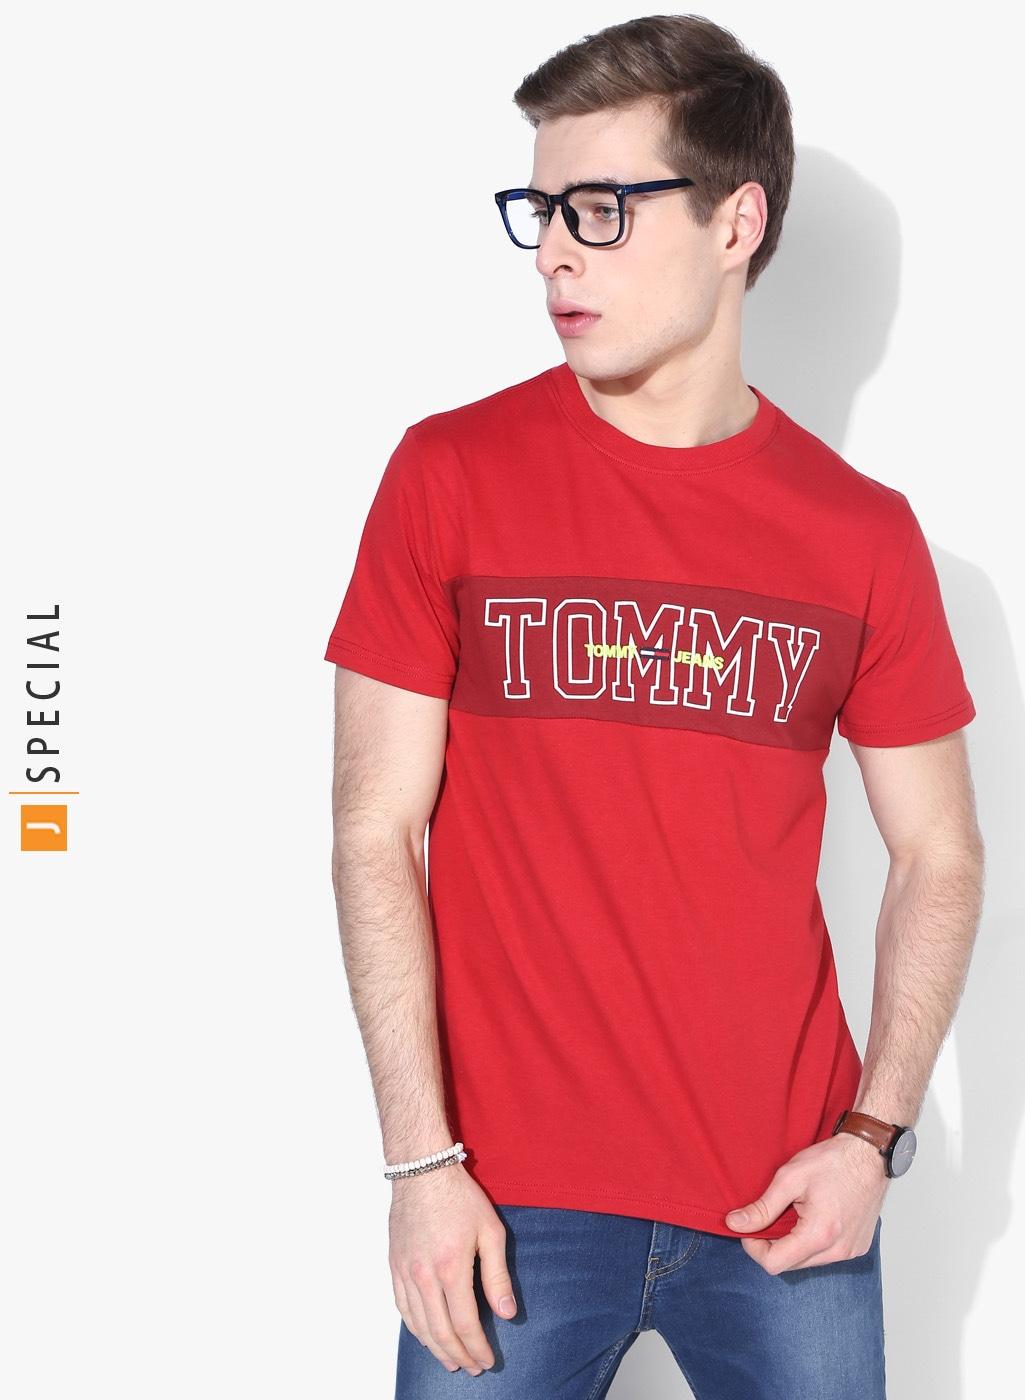 Tommy Hilfiger Men Lavender Printed Round Neck T shirt